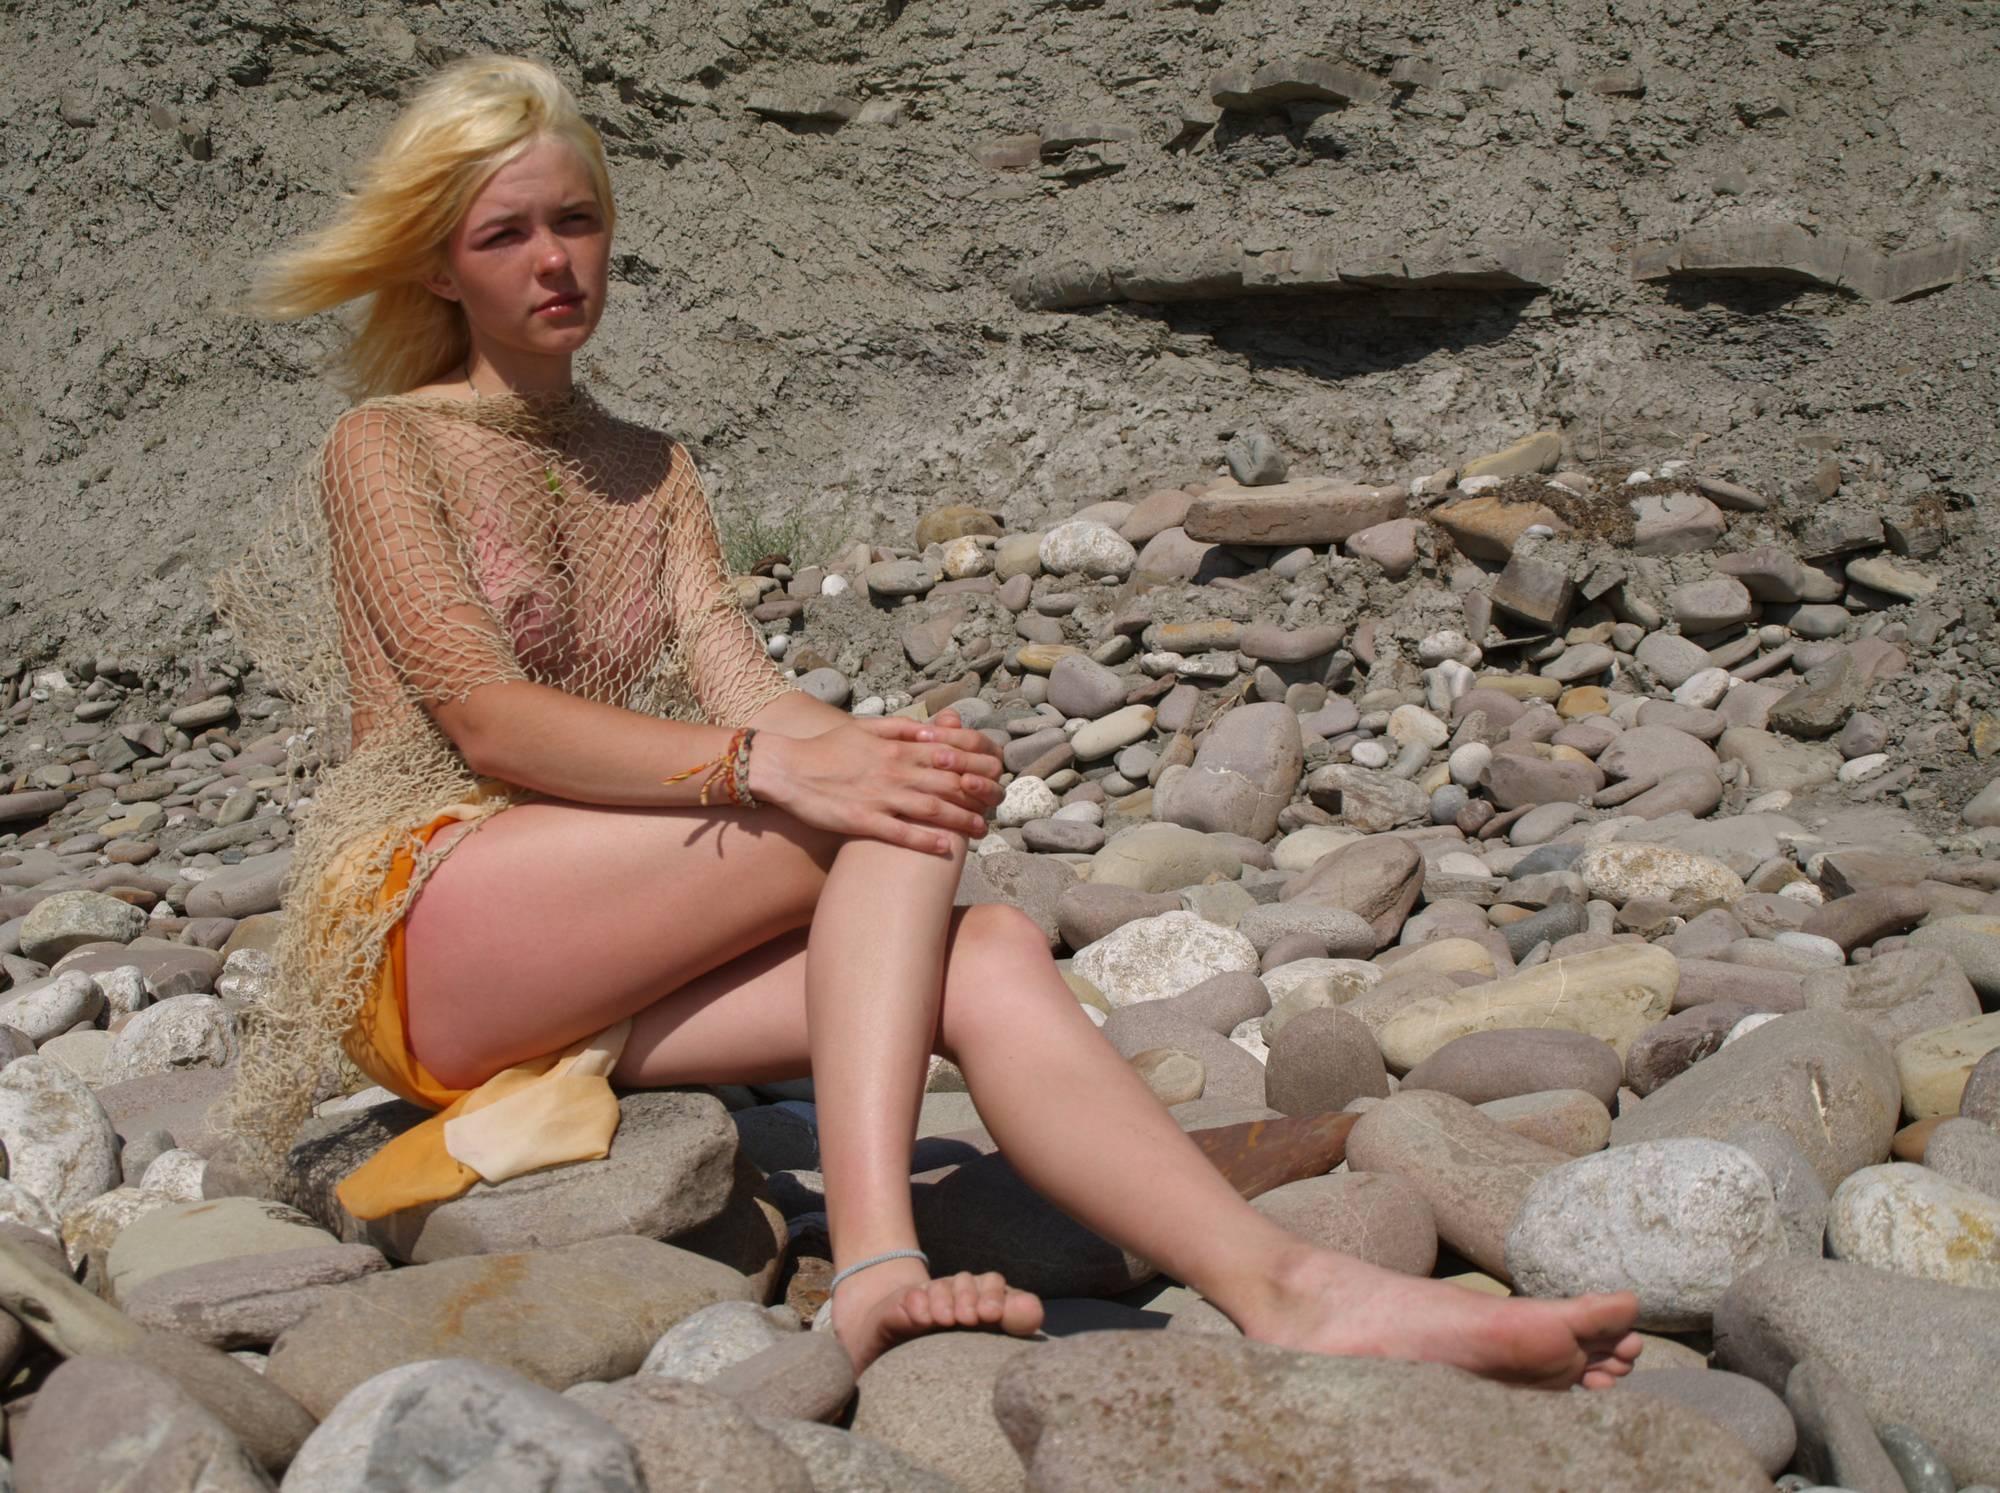 Blonde Beach Rock Beauty - 2